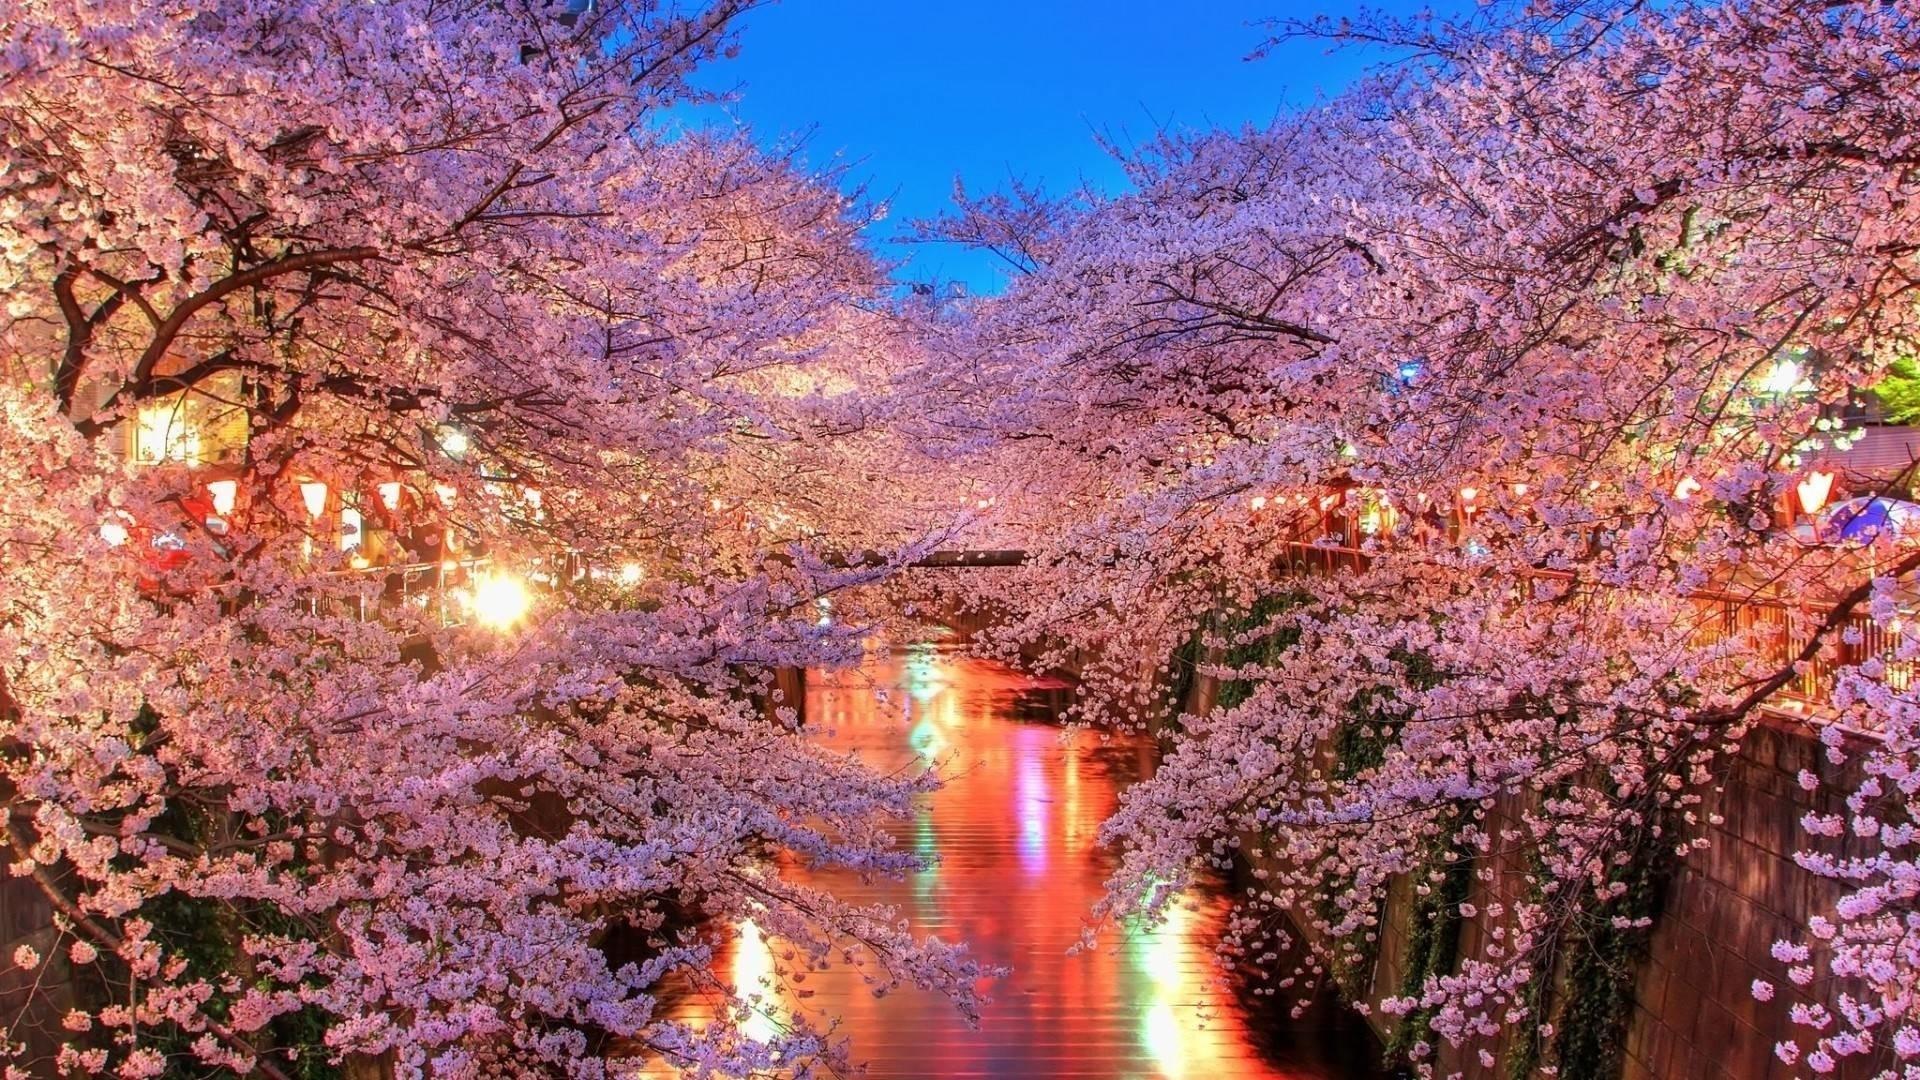 japanese cherry blossom wallpaper 1920x1080 (59+ images)